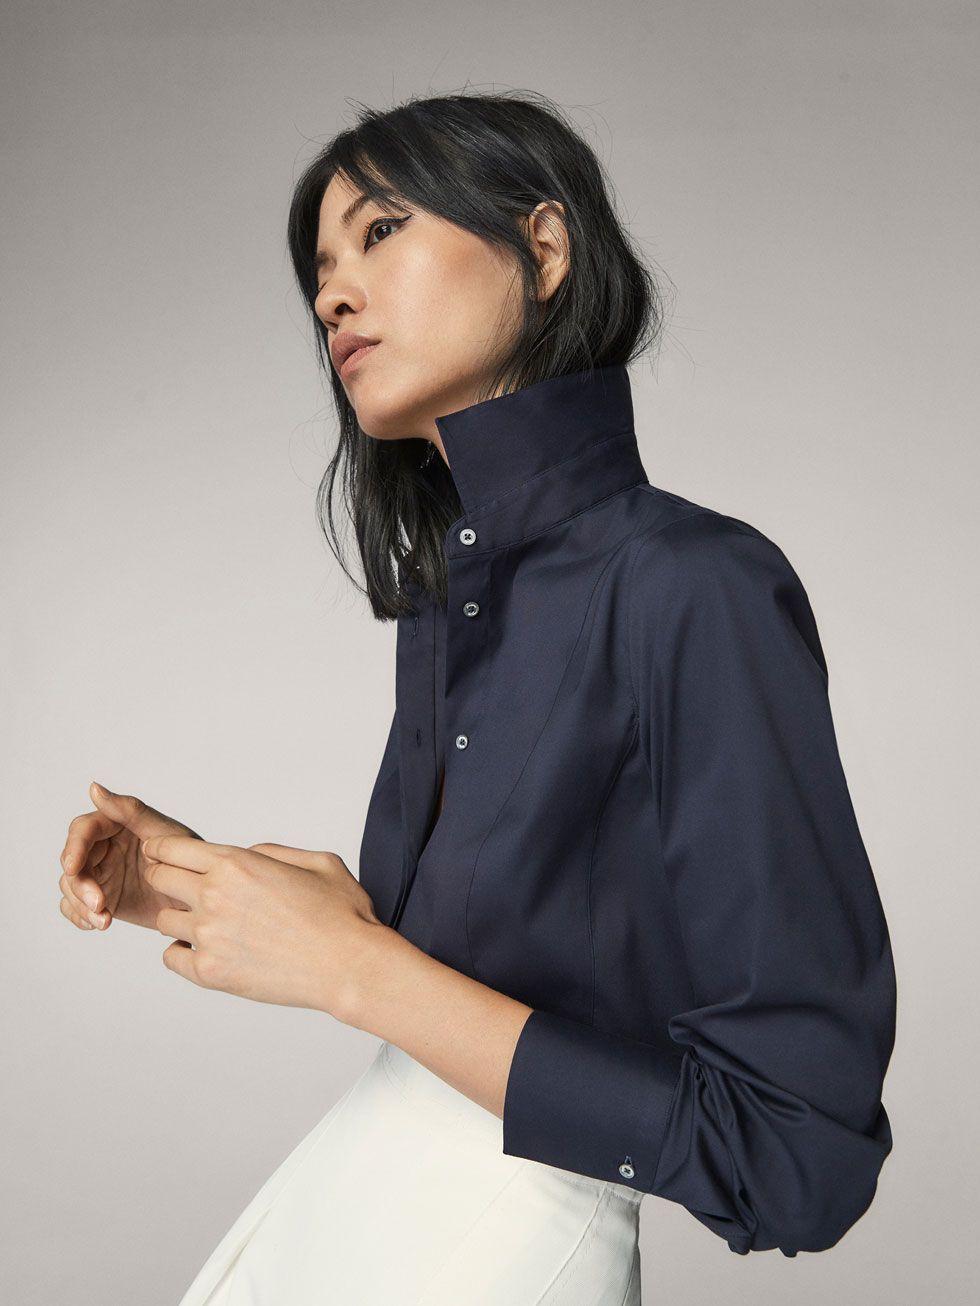 Dutti Detalle Camisa Massimo Mujer Costuras Lisa Fit Stretch Z1HwB1